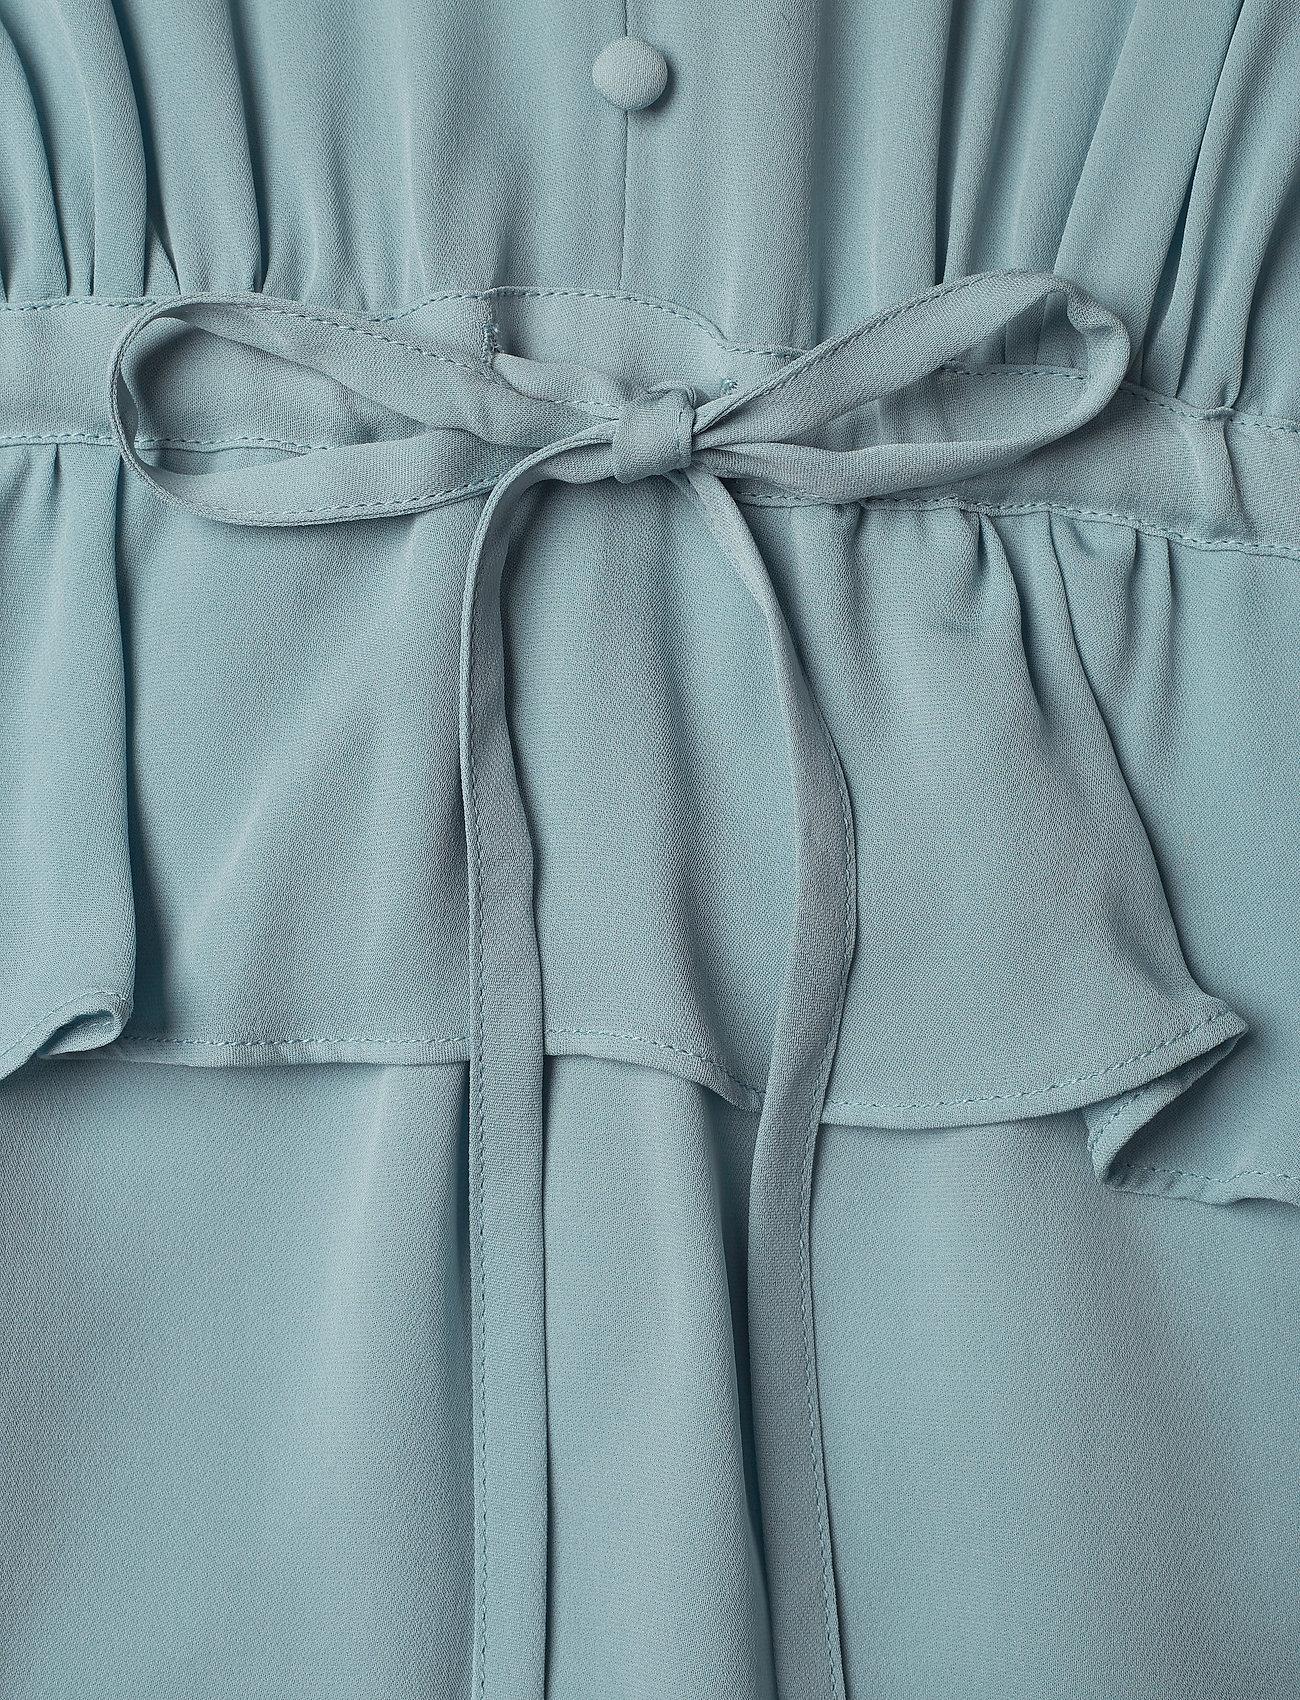 Mayla Stockholm Lola Maxi Dress - Klänningar Vintage Blue